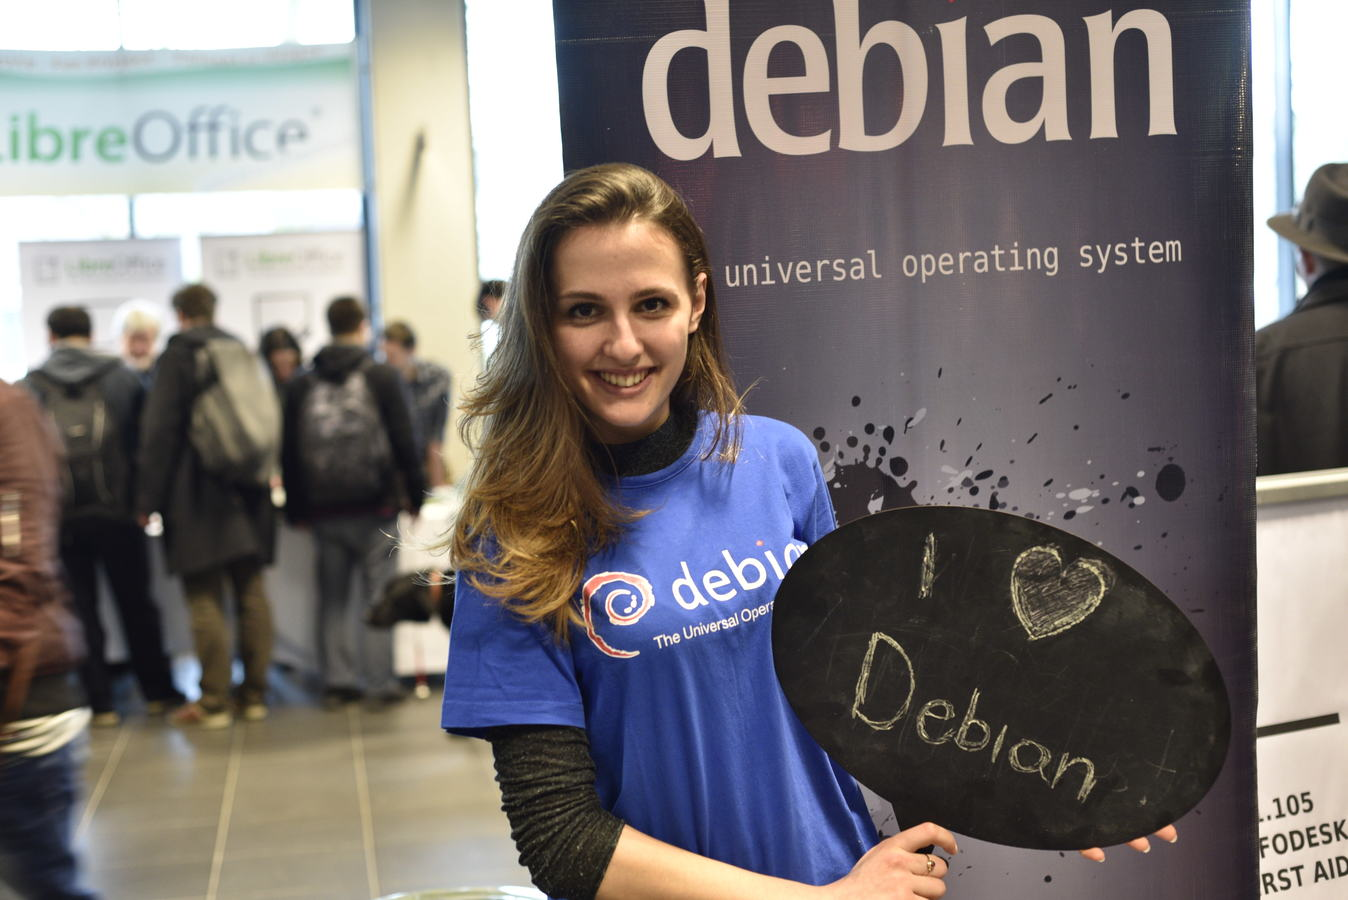 I love Debian